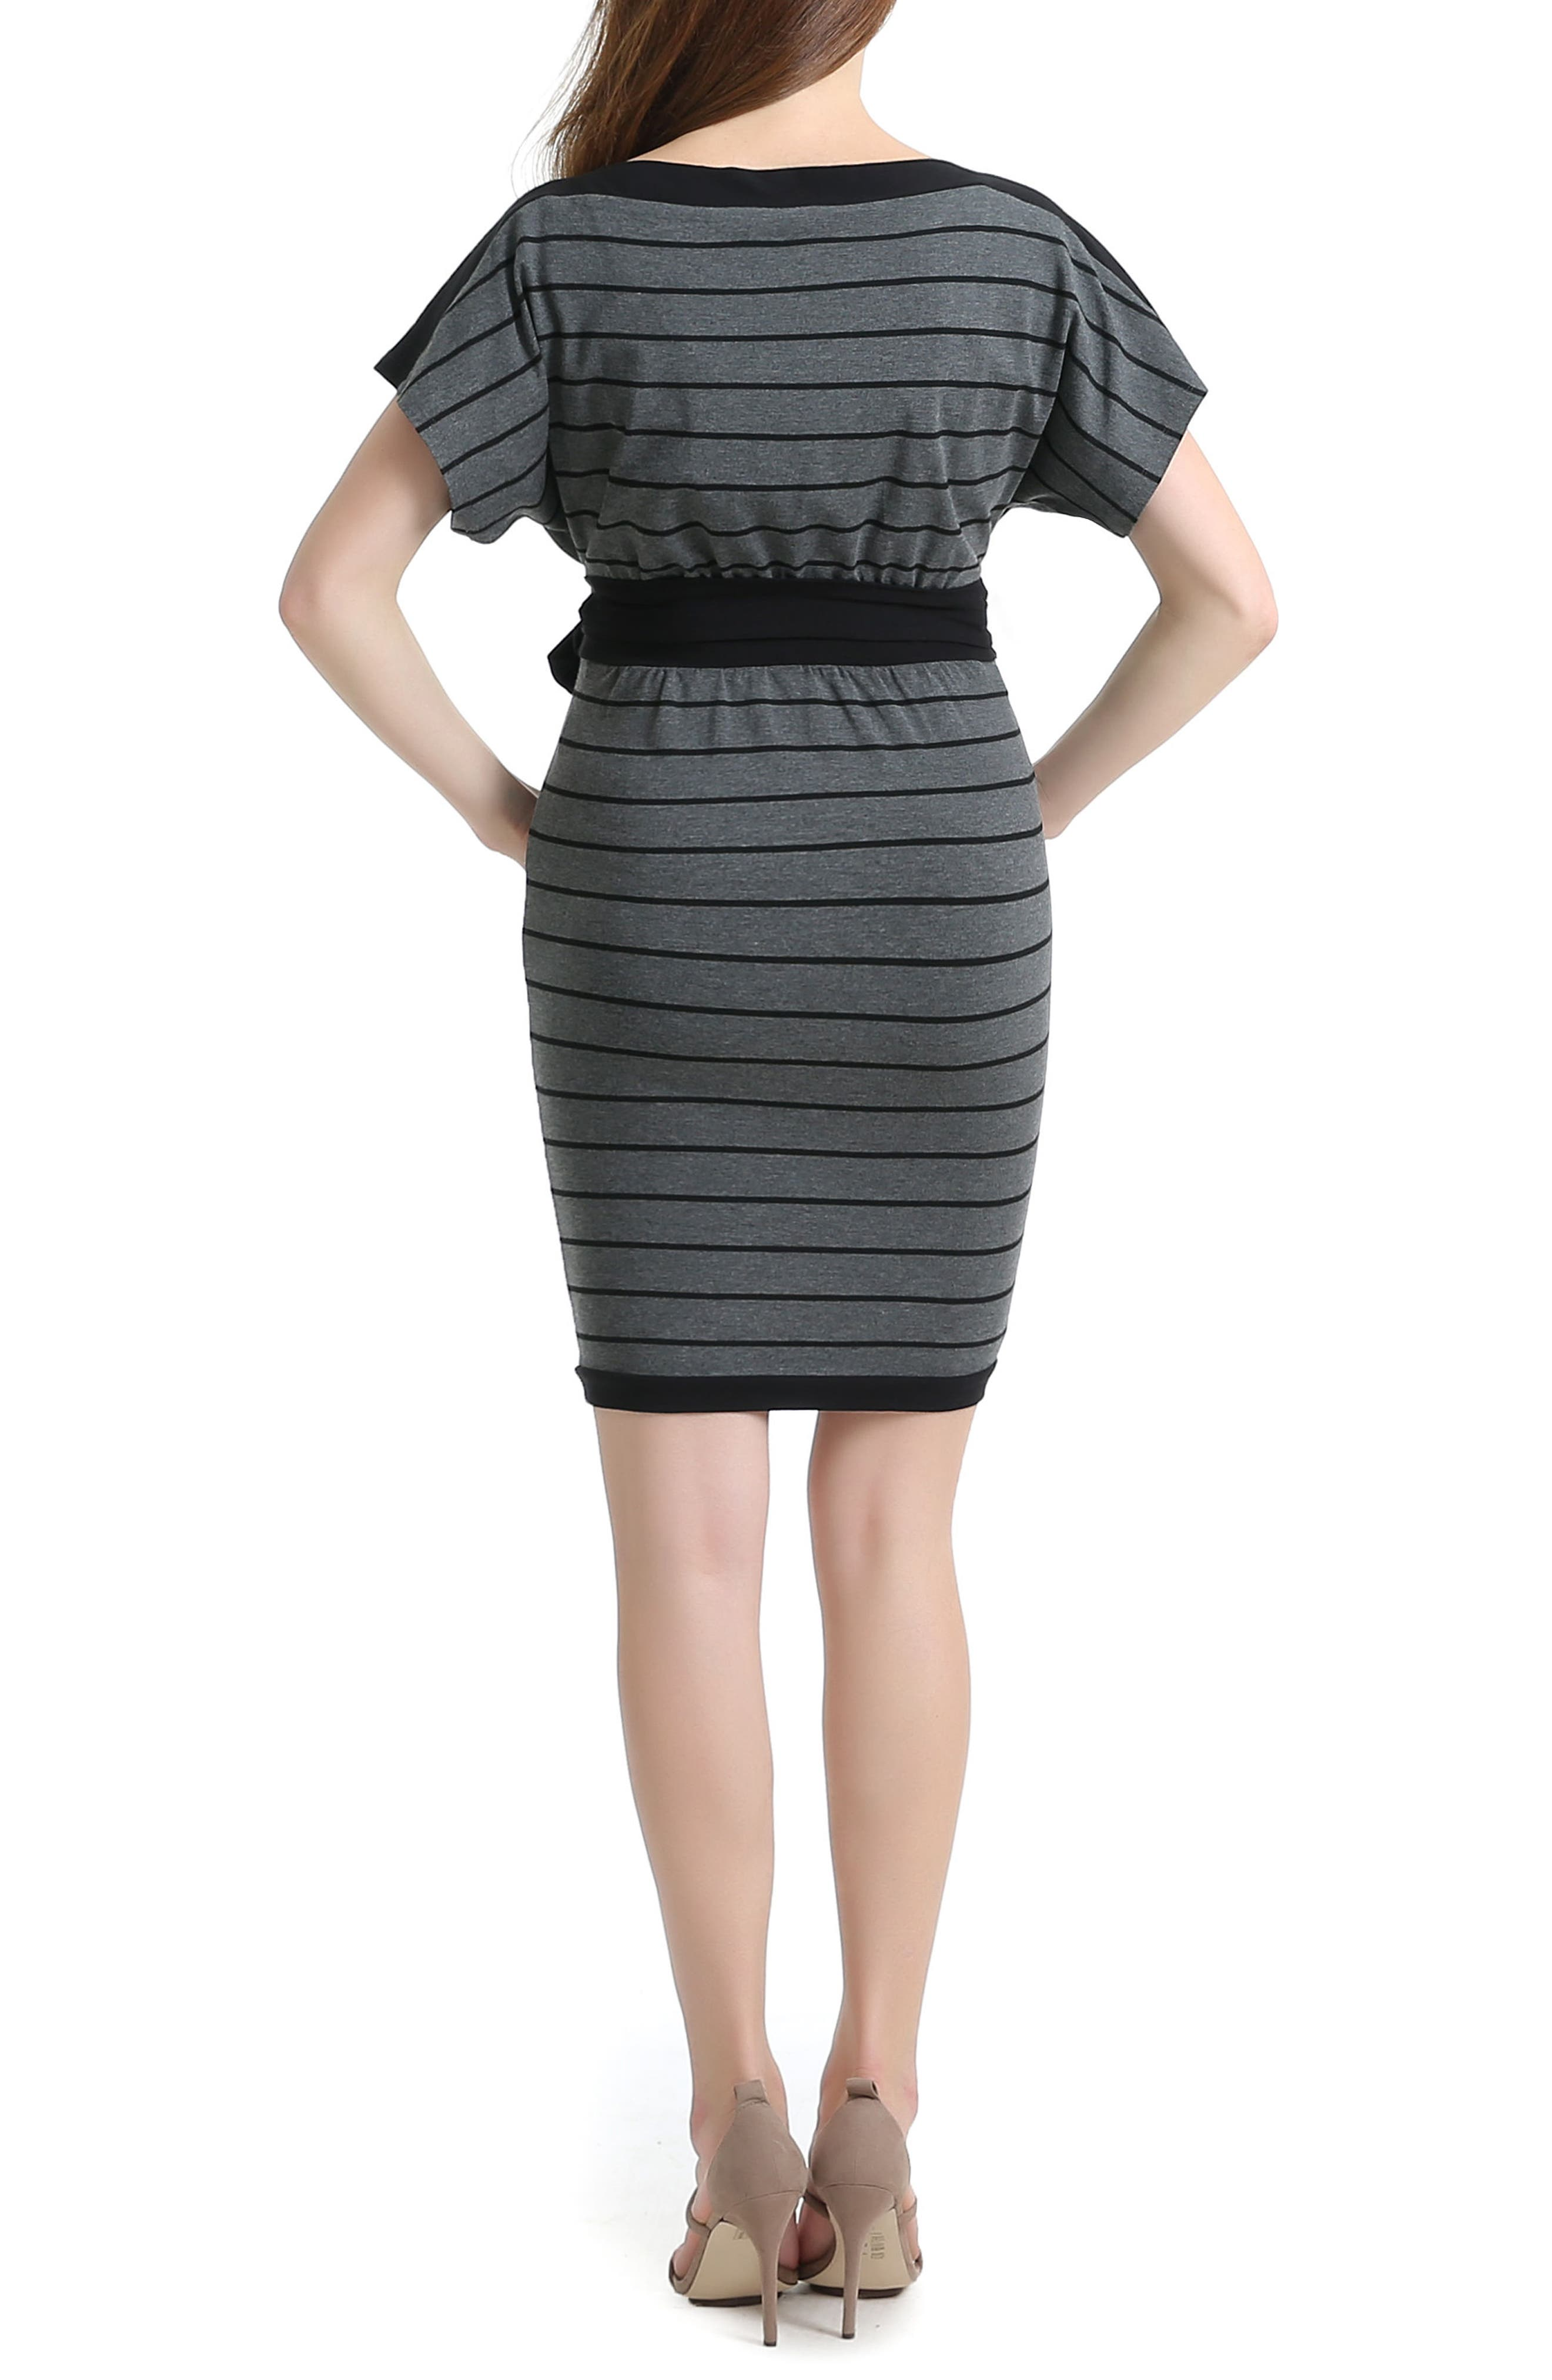 Anna Stretch Maternity Dress,                             Alternate thumbnail 2, color,                             Black/ Gray